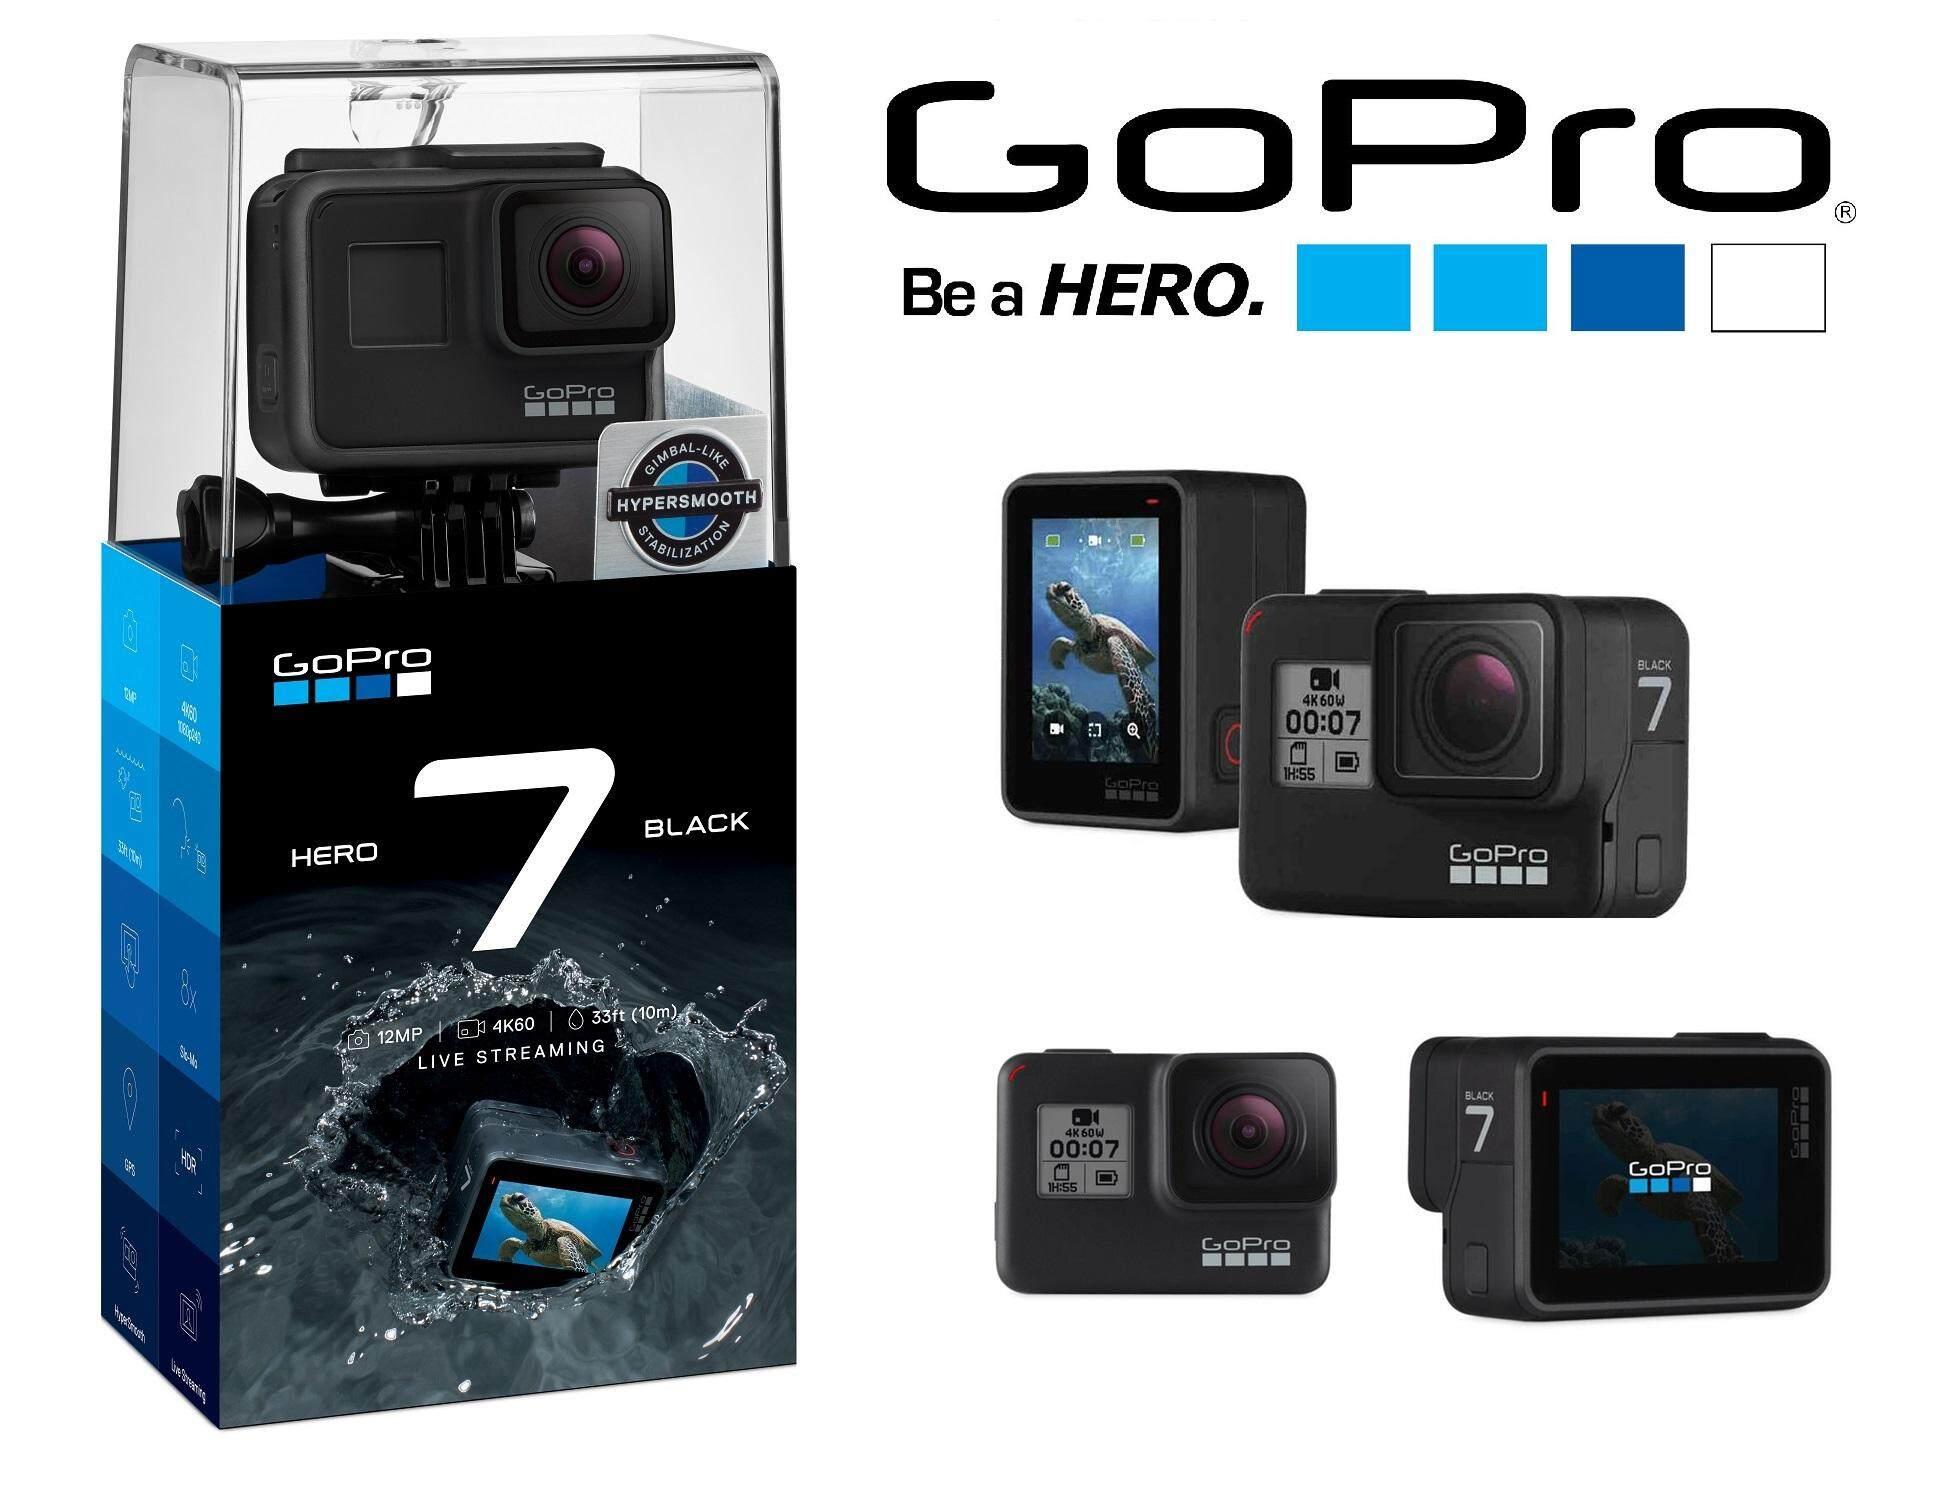 GoPro HERO 7 Black [FunSportz Malaysia Warranty] FOC 1pc Extra GoPro Battery, 1pc GoPro Sleeve+Lanyard, 1pc Sandisk Extreme 32GB SD CARD, 1pc 3WAY Monopod & 1pc GoCase Bag